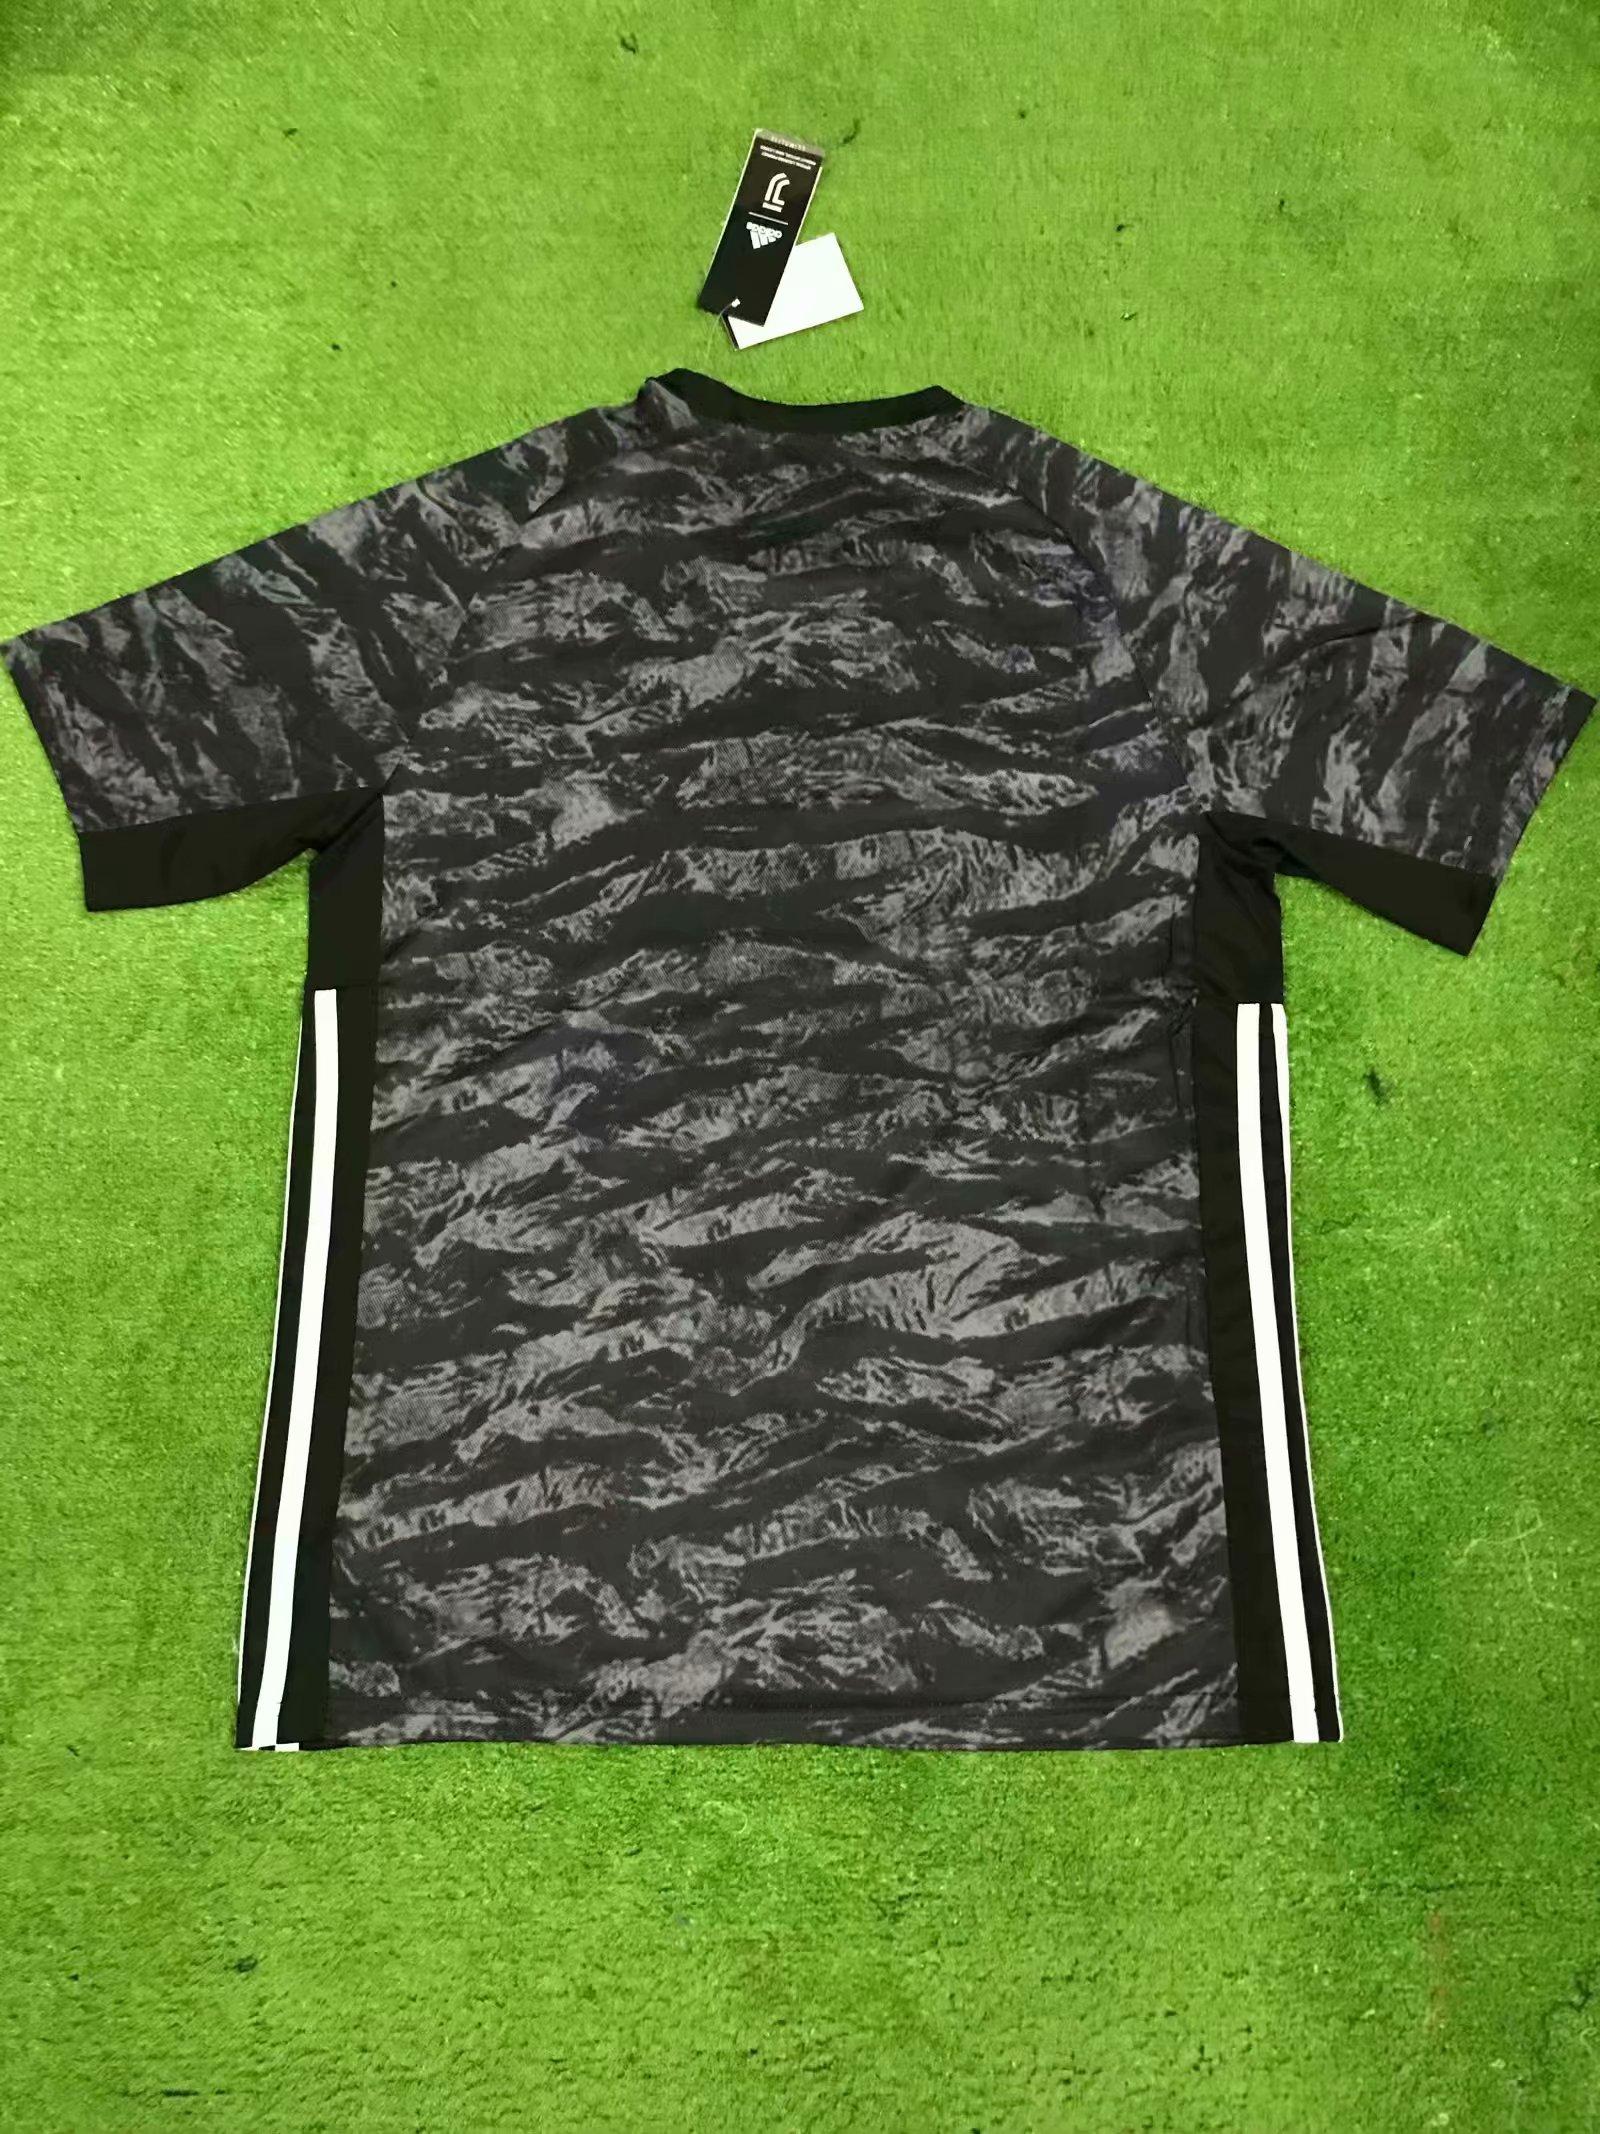 0035a8c479f 19-20 Men juventus Goalkeeper Fan version Soccer jersey Item NO  587321